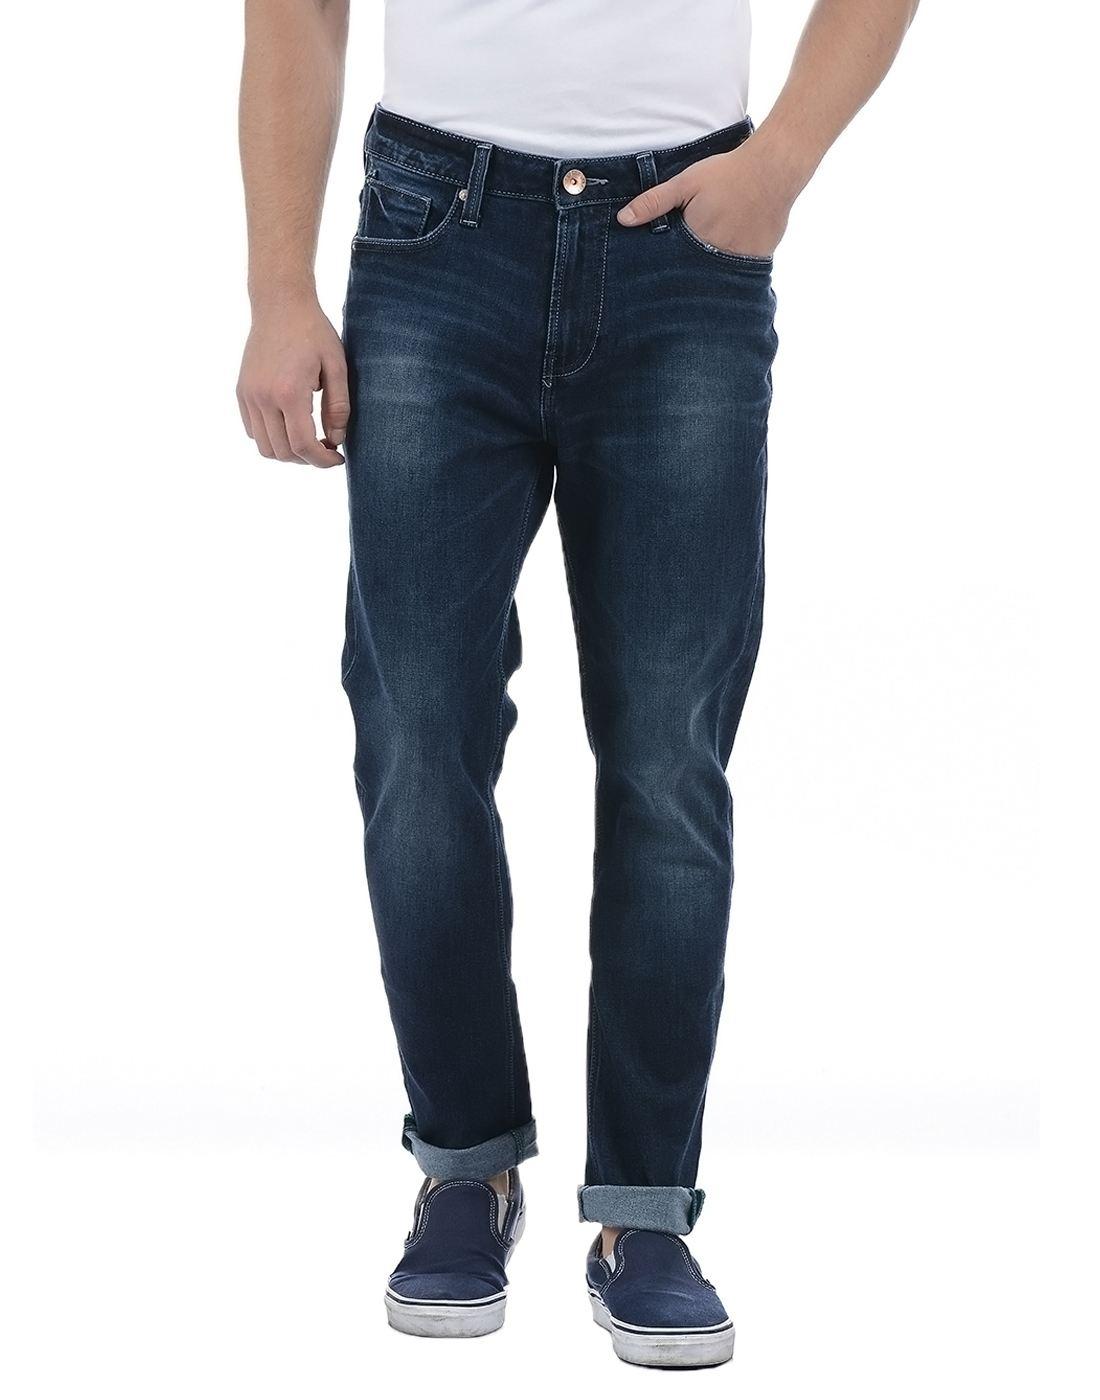 United Colors of Benetton Men's Blue Light Fade Jeans